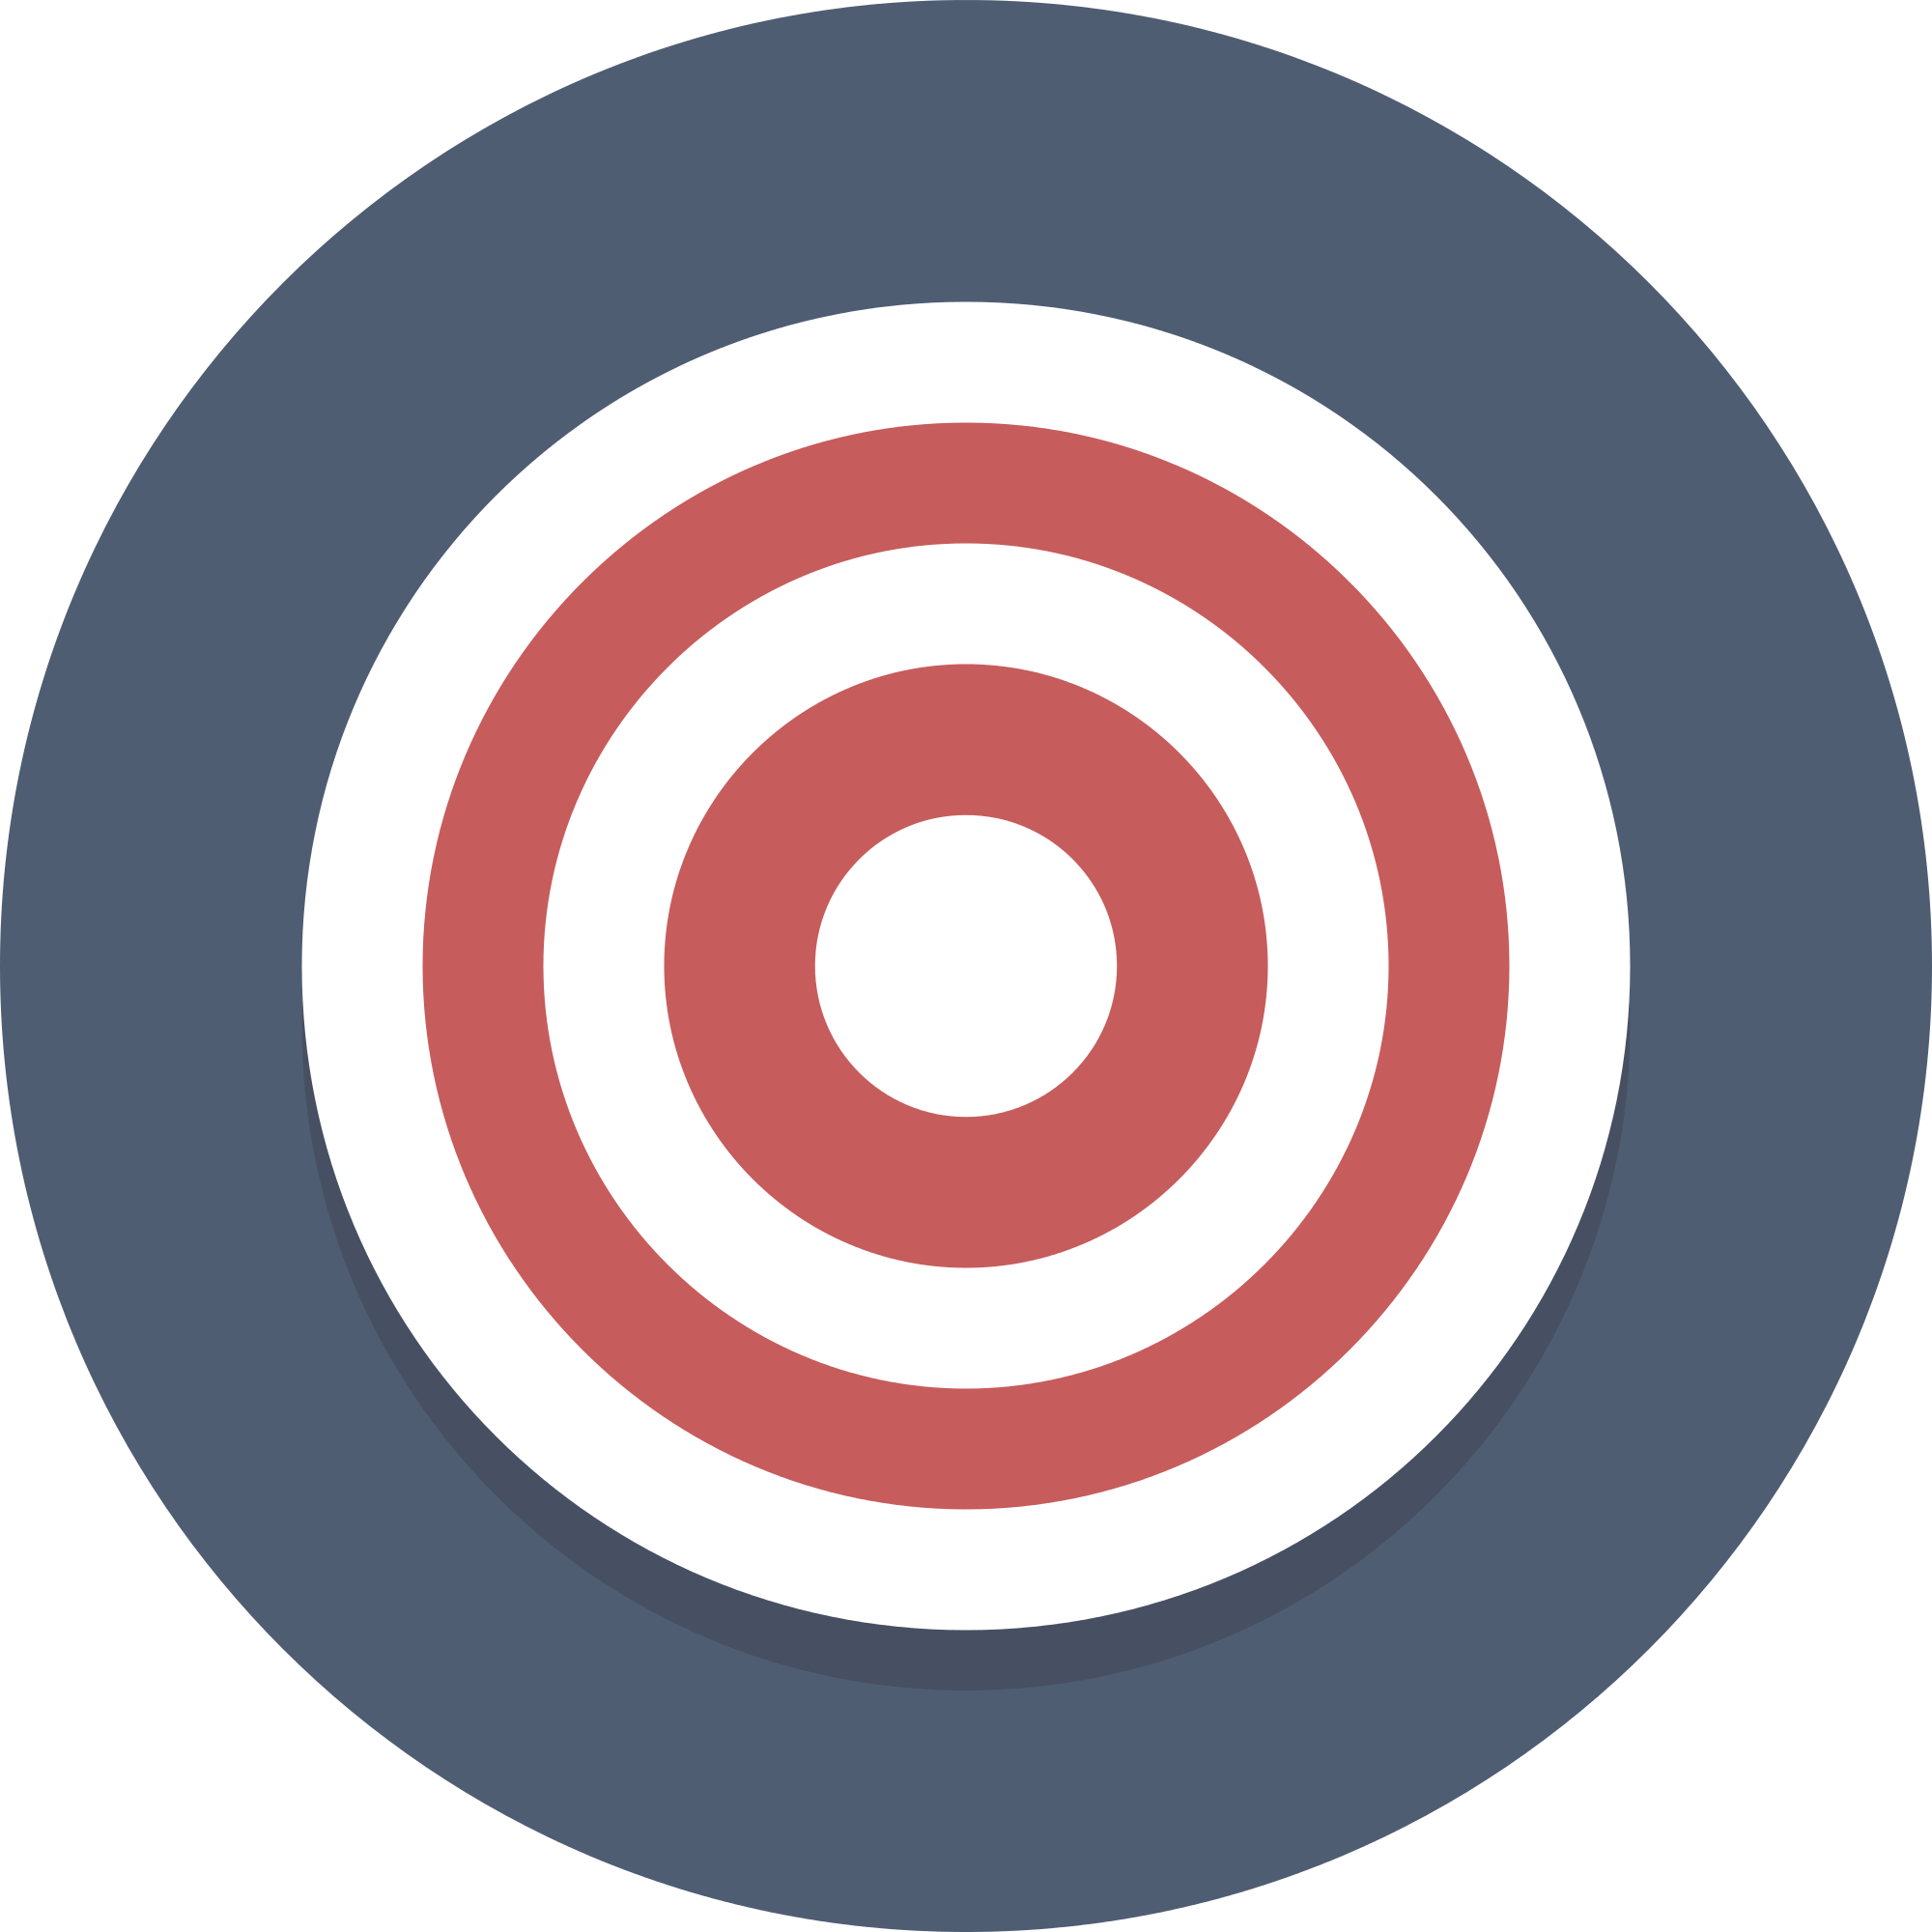 Bullseye clipart transparent background. Target png